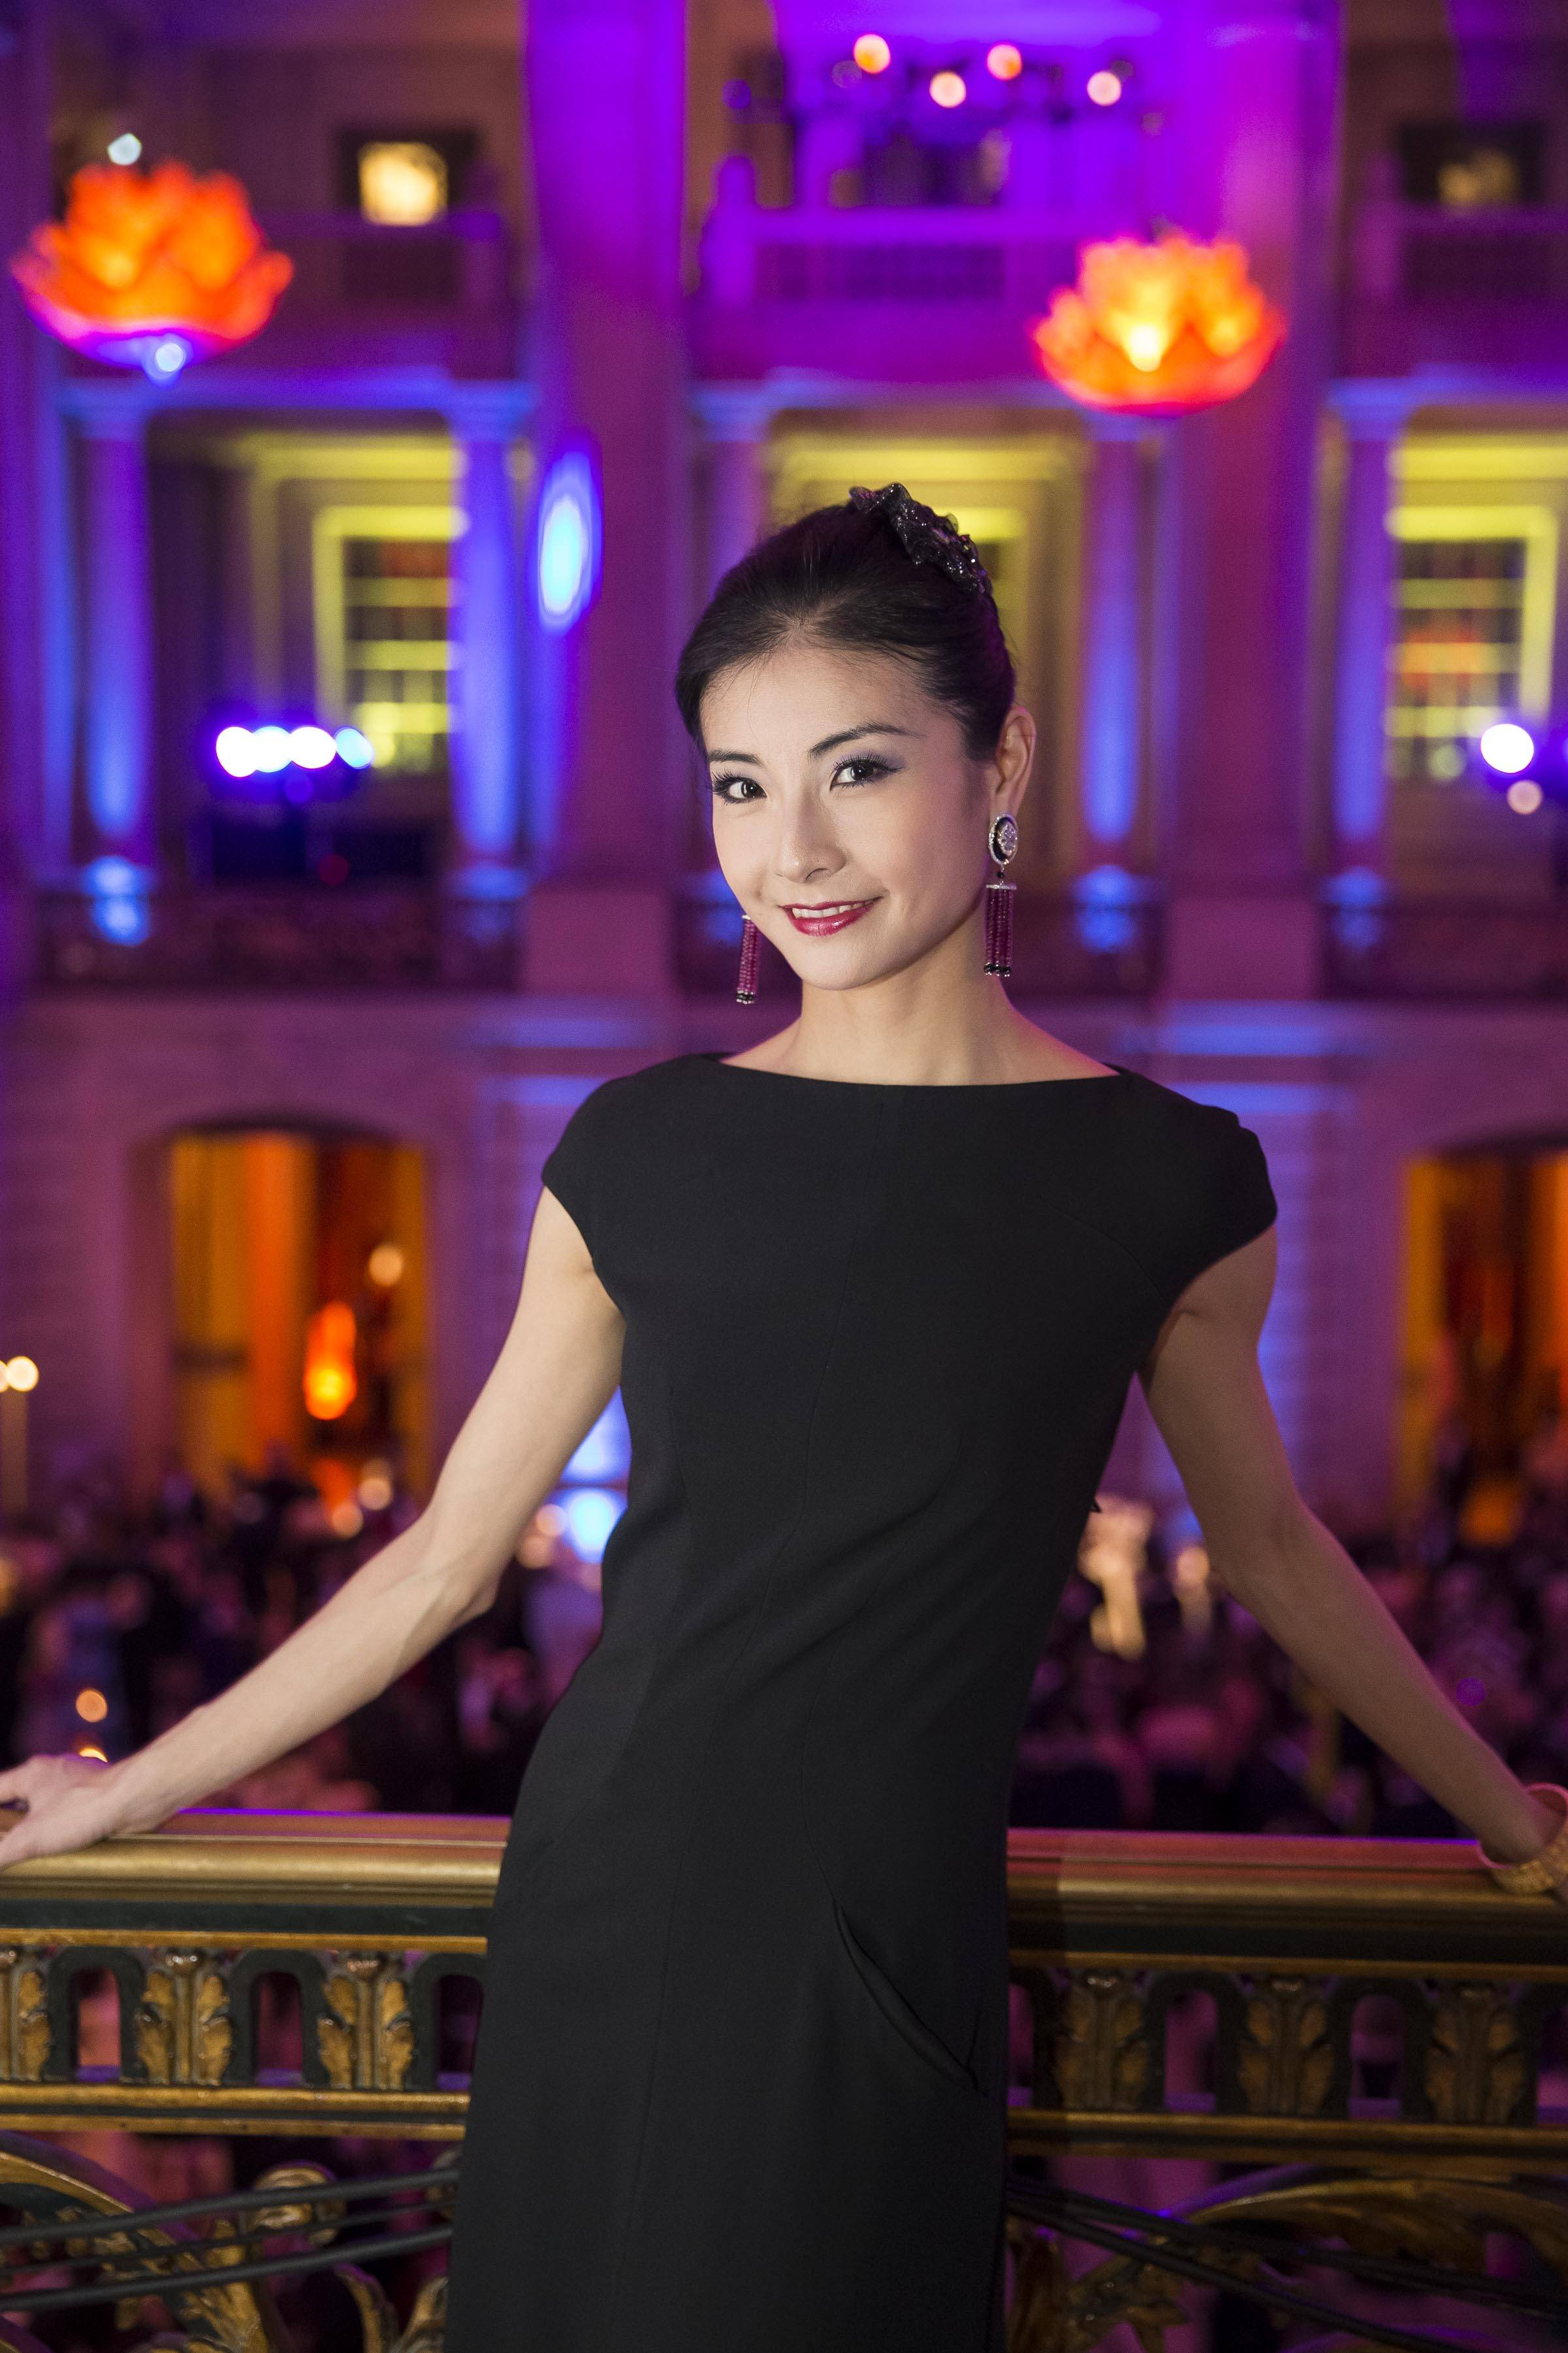 Yuan Yuan Tan